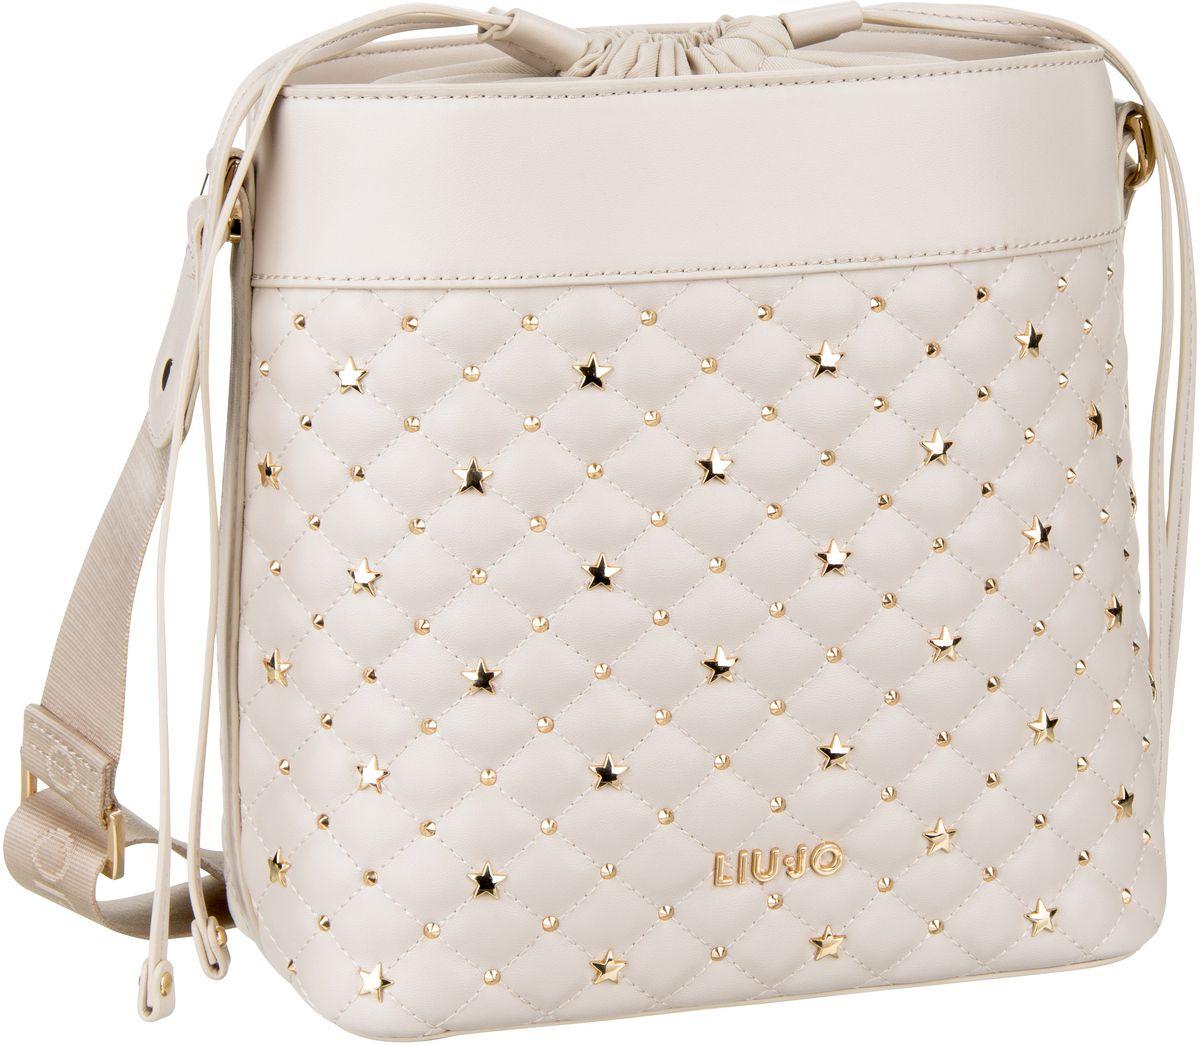 Handtasche Tiberina Drawstring M Soia